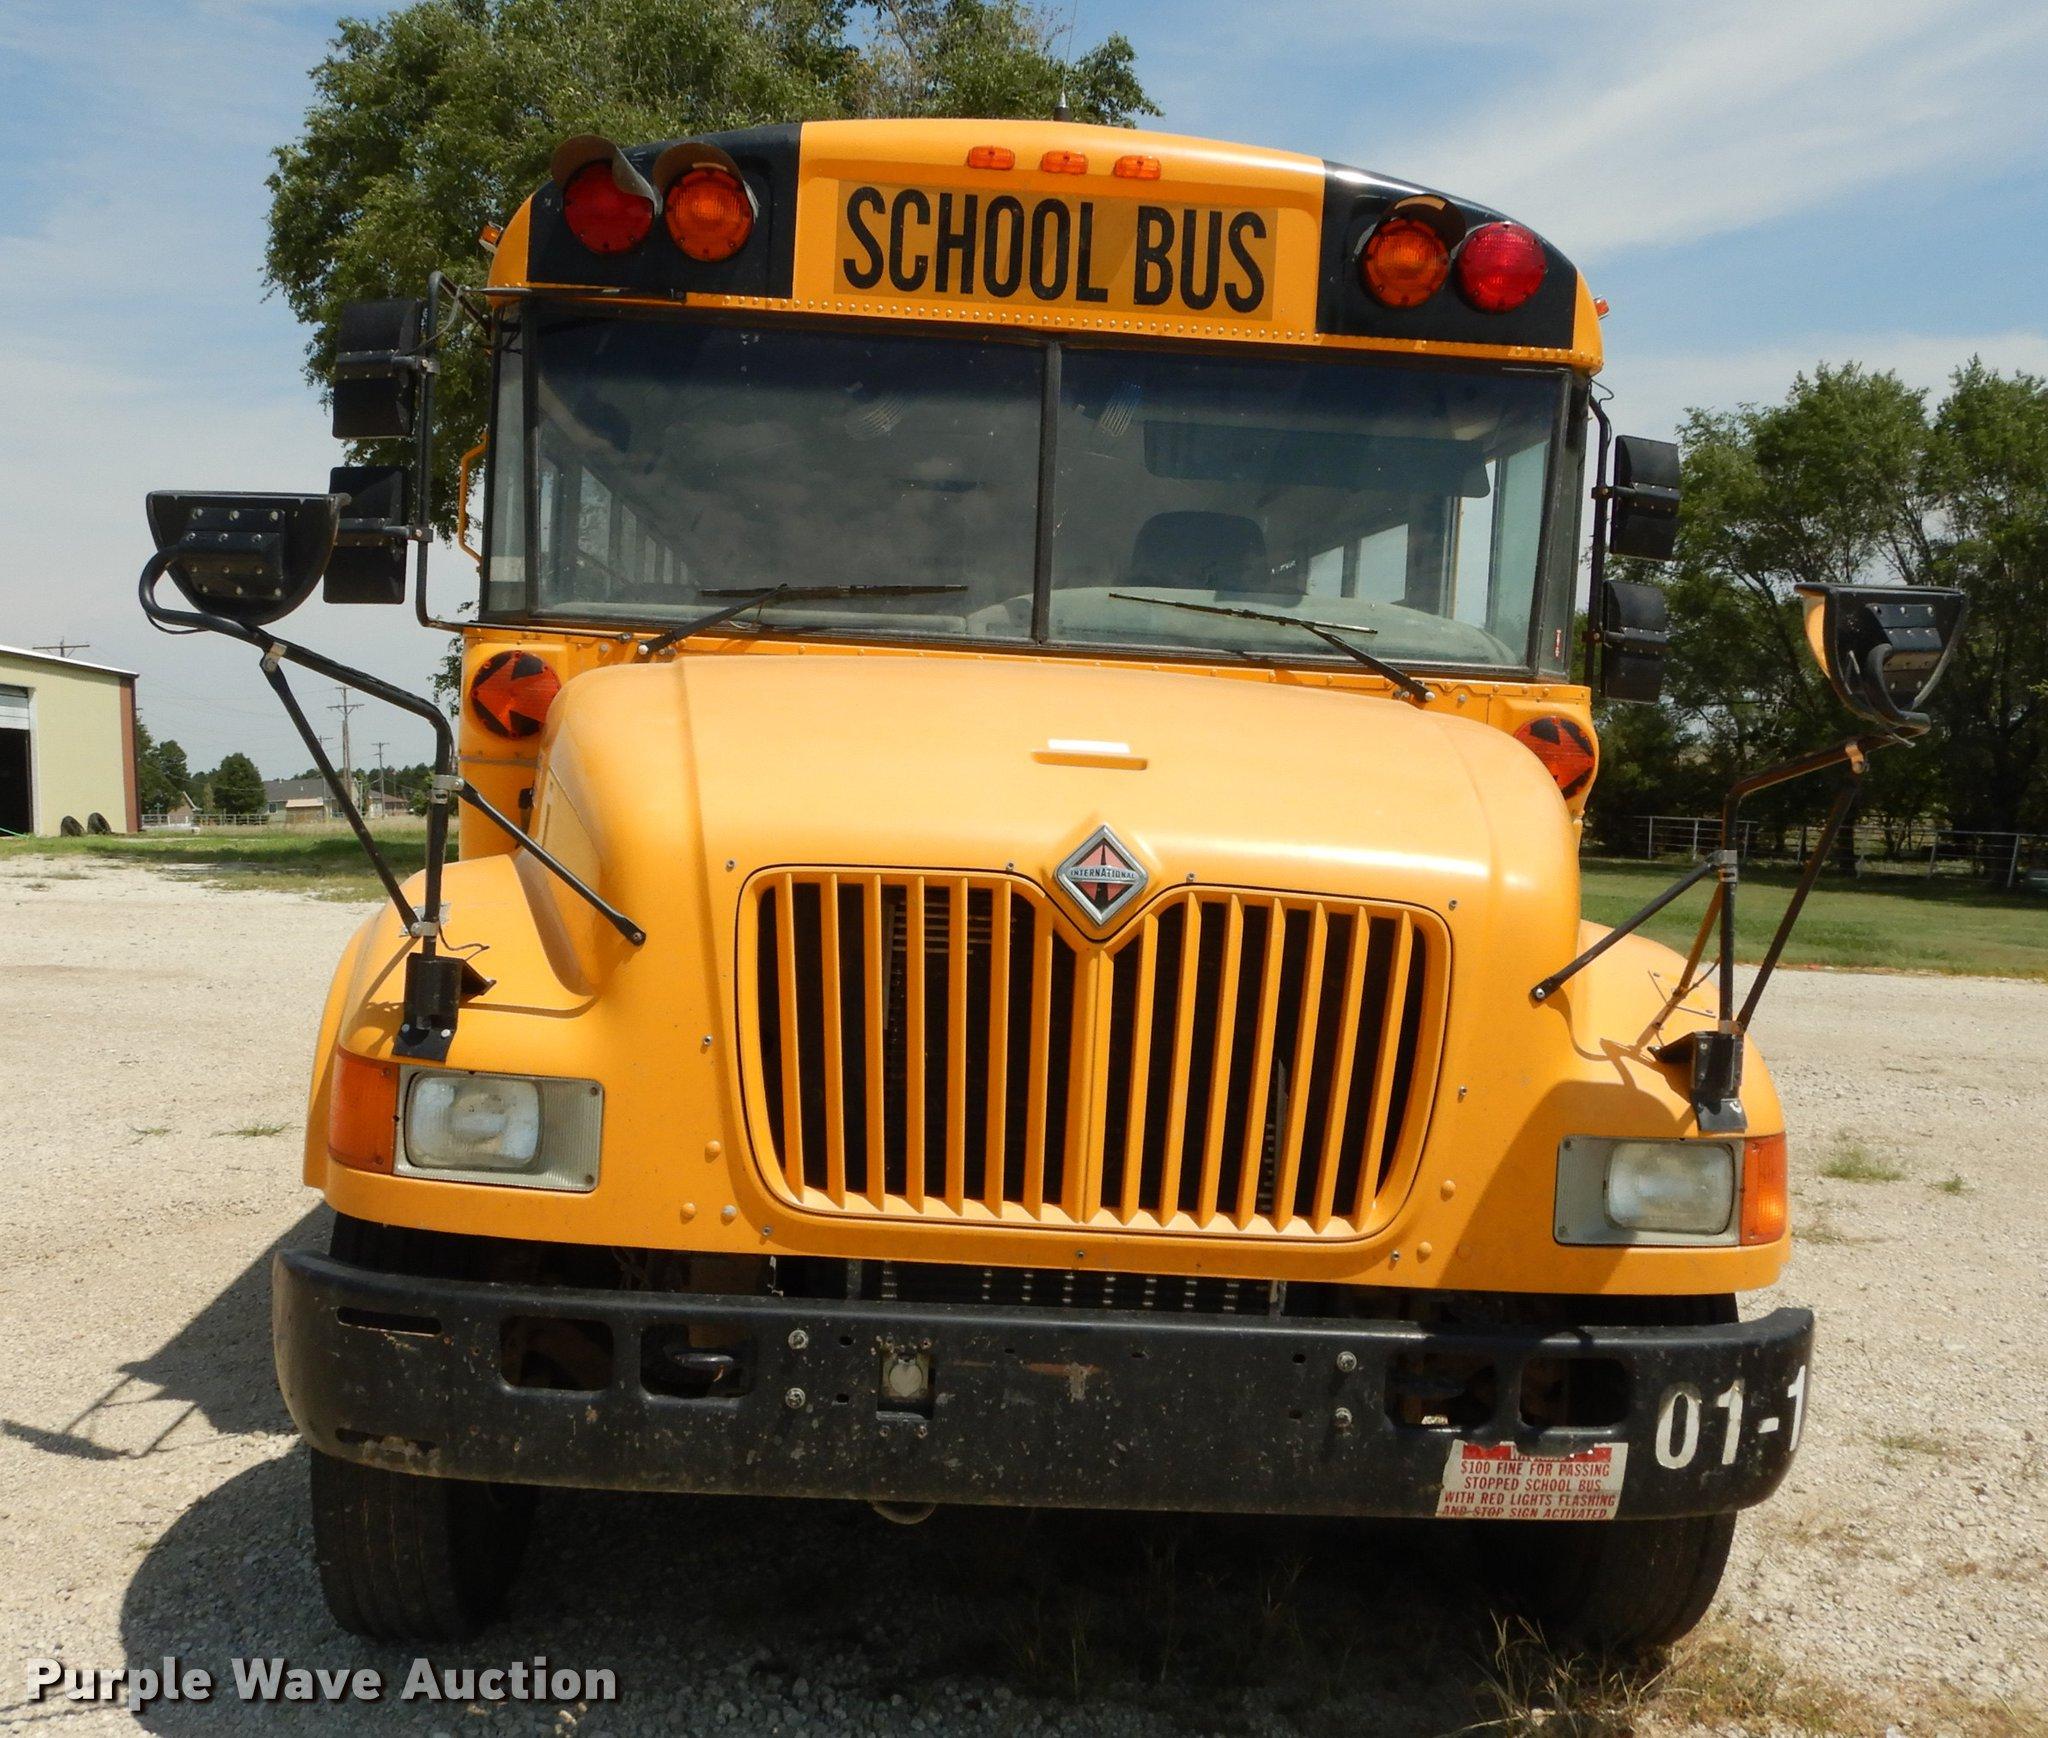 2001 International 3800 ATC school bus | Item DB8393 | SOLD!